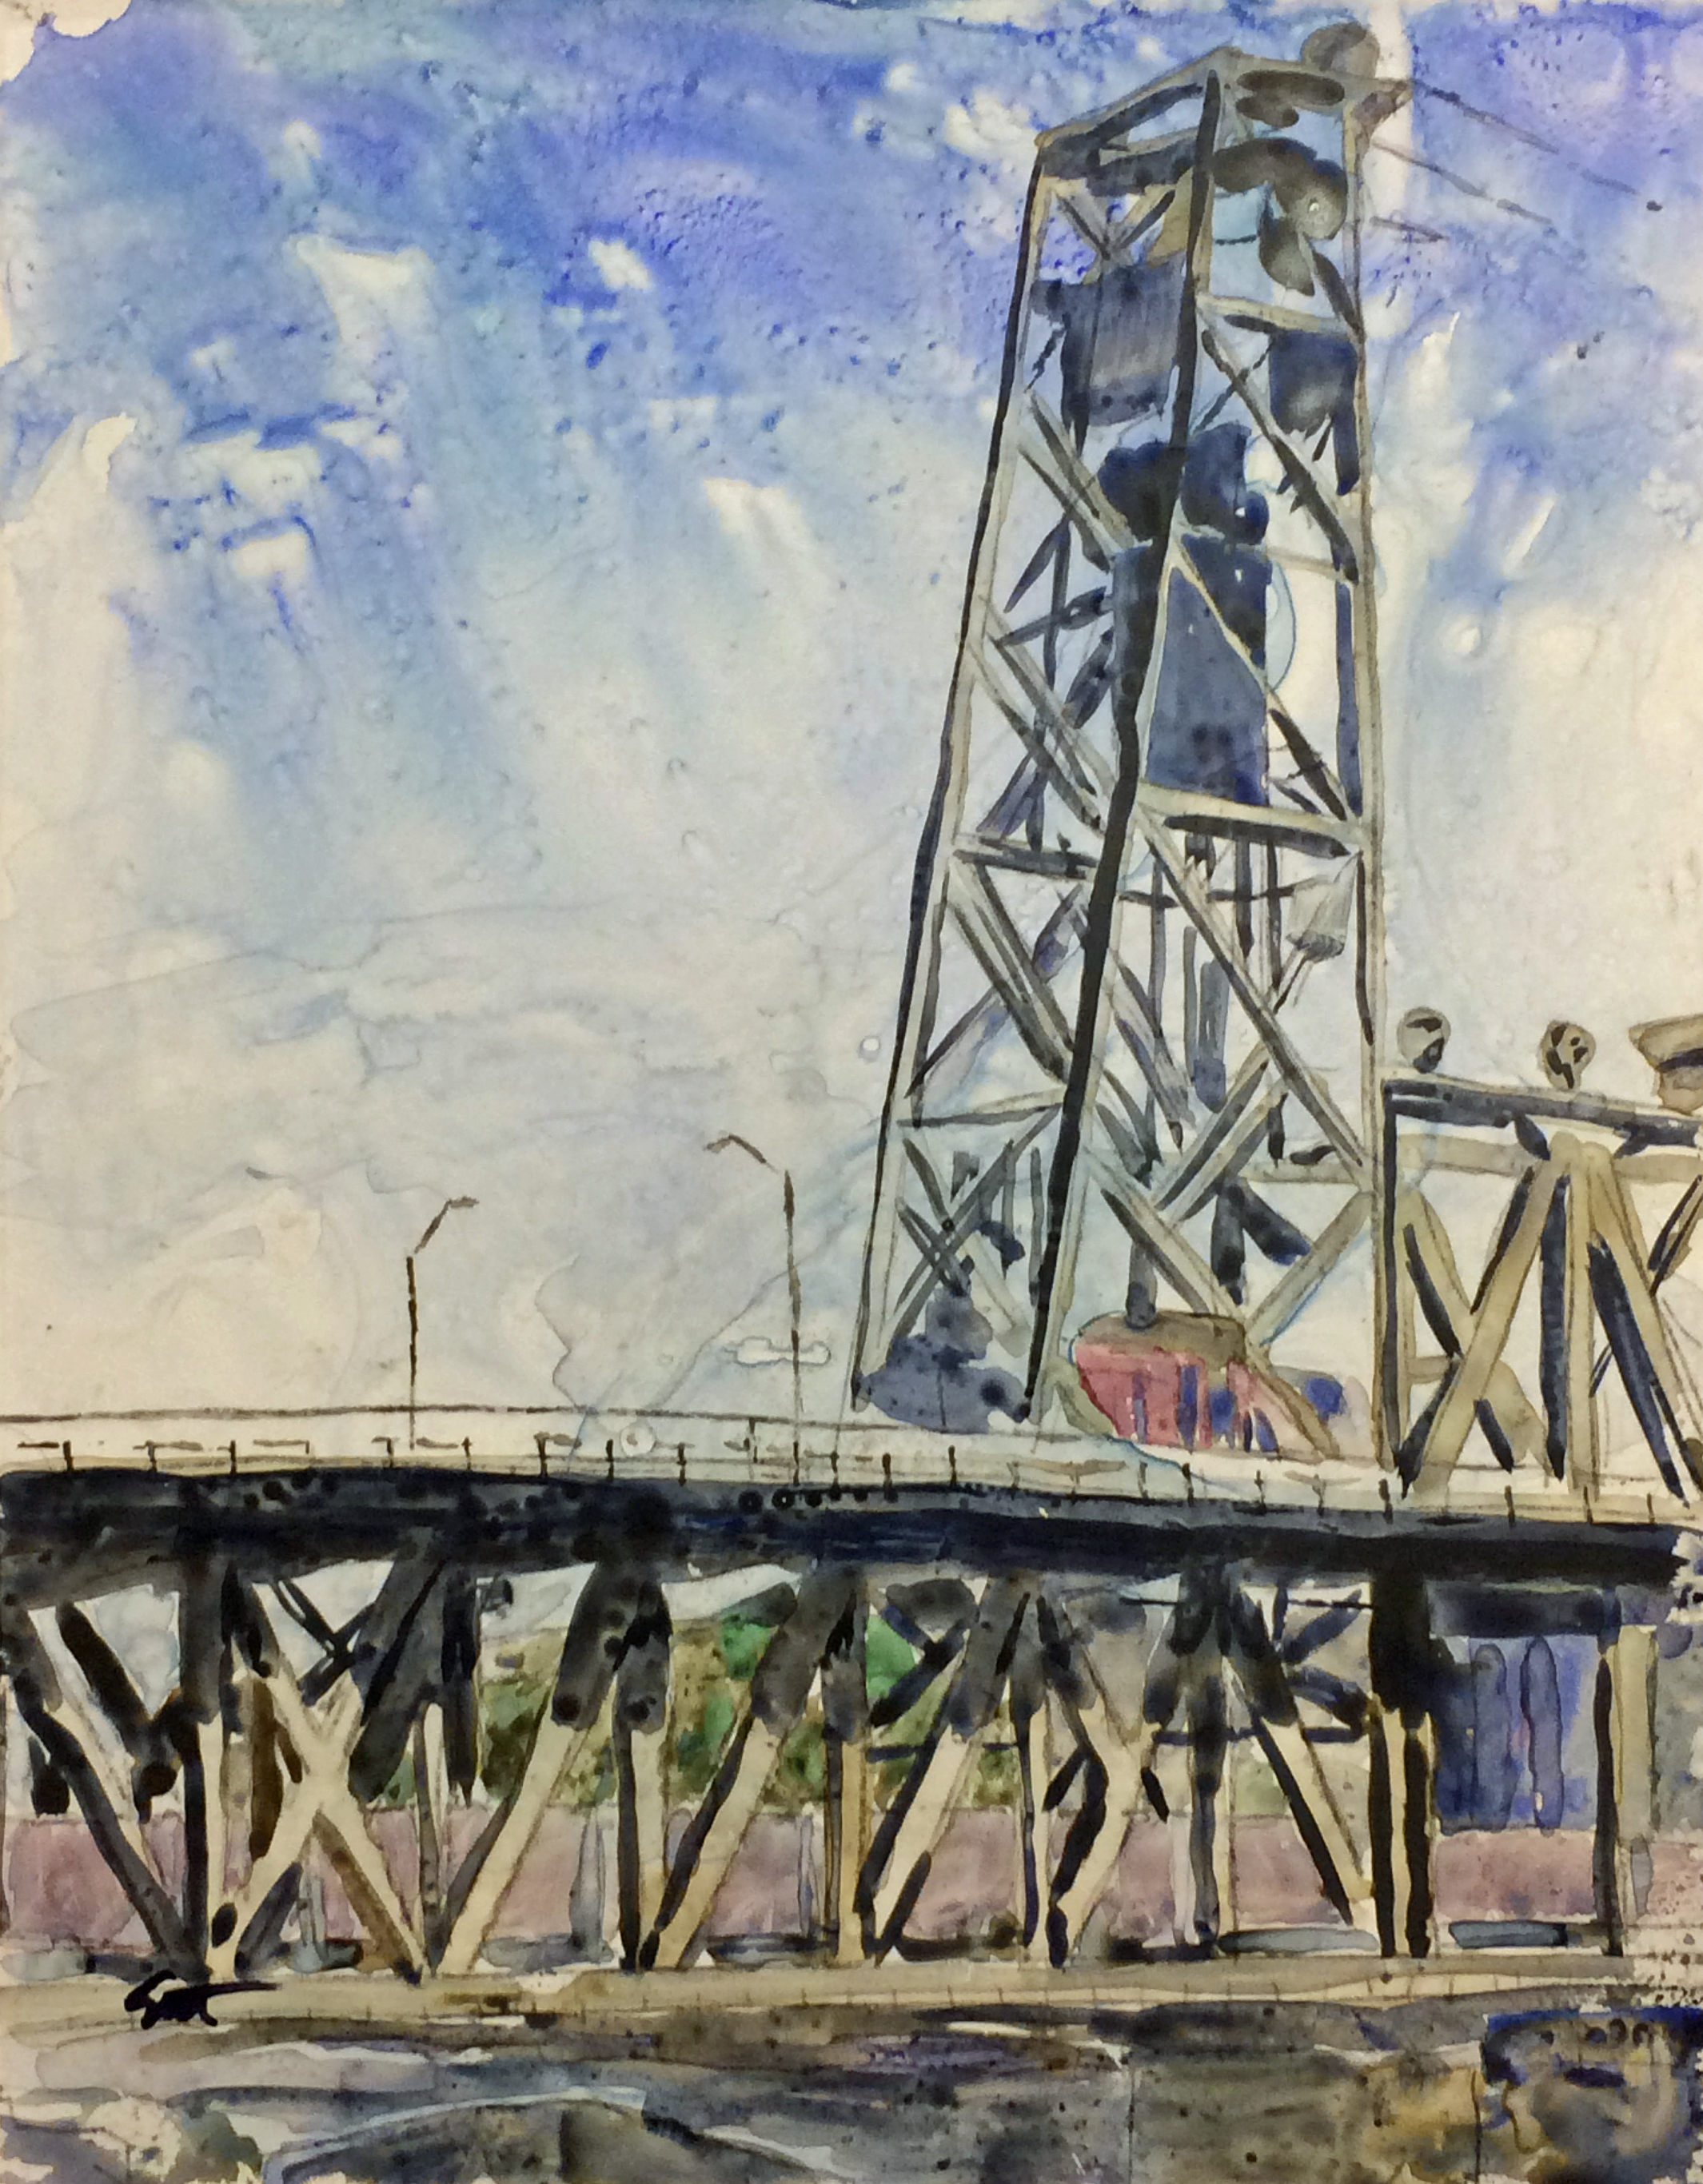 The Steele Bridge